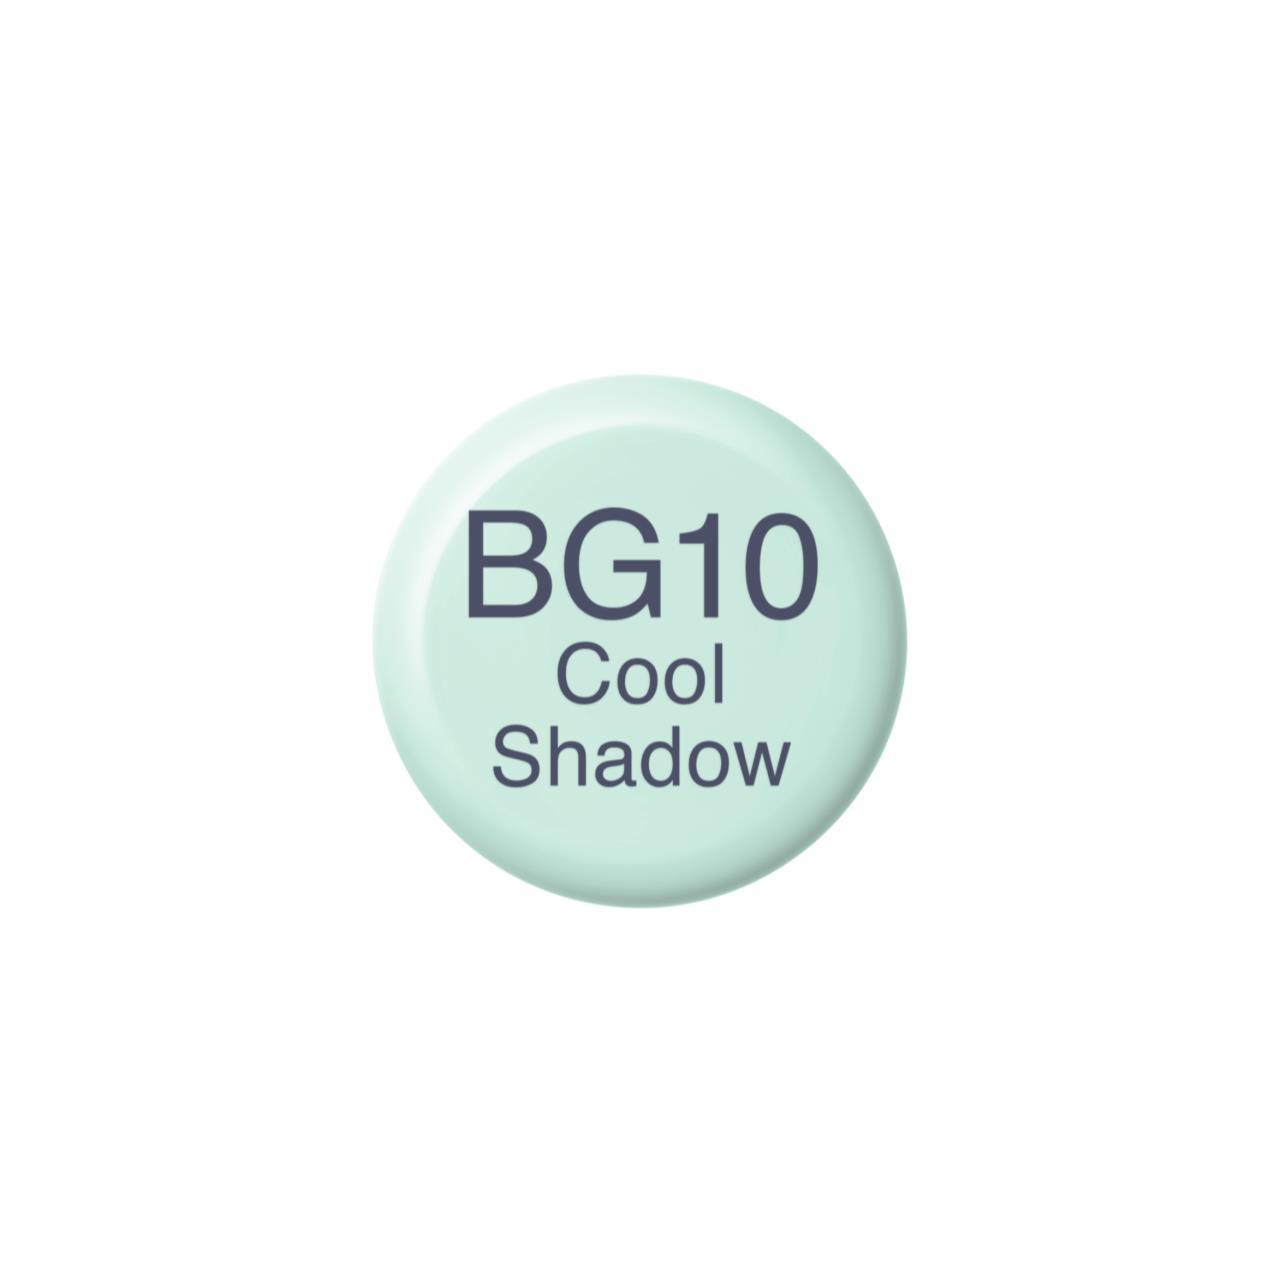 BG10 Cool Shadow, Copic Ink - 4511338056226